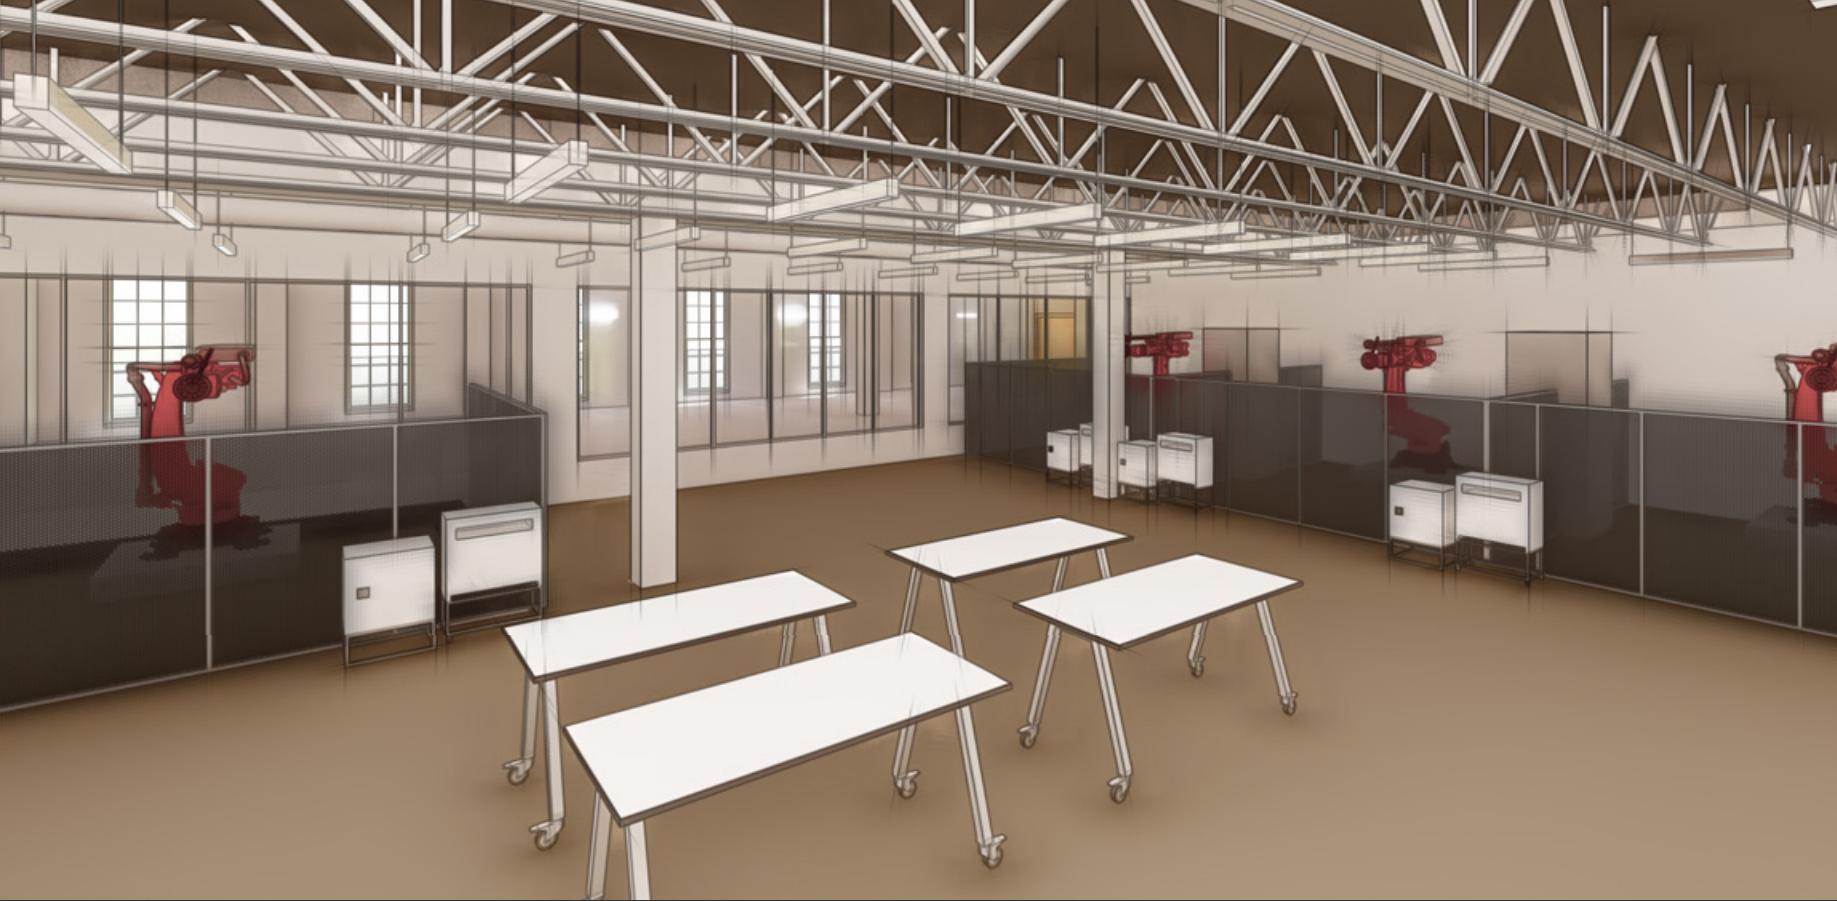 Alabama IMaDE lab computer rendering view 2